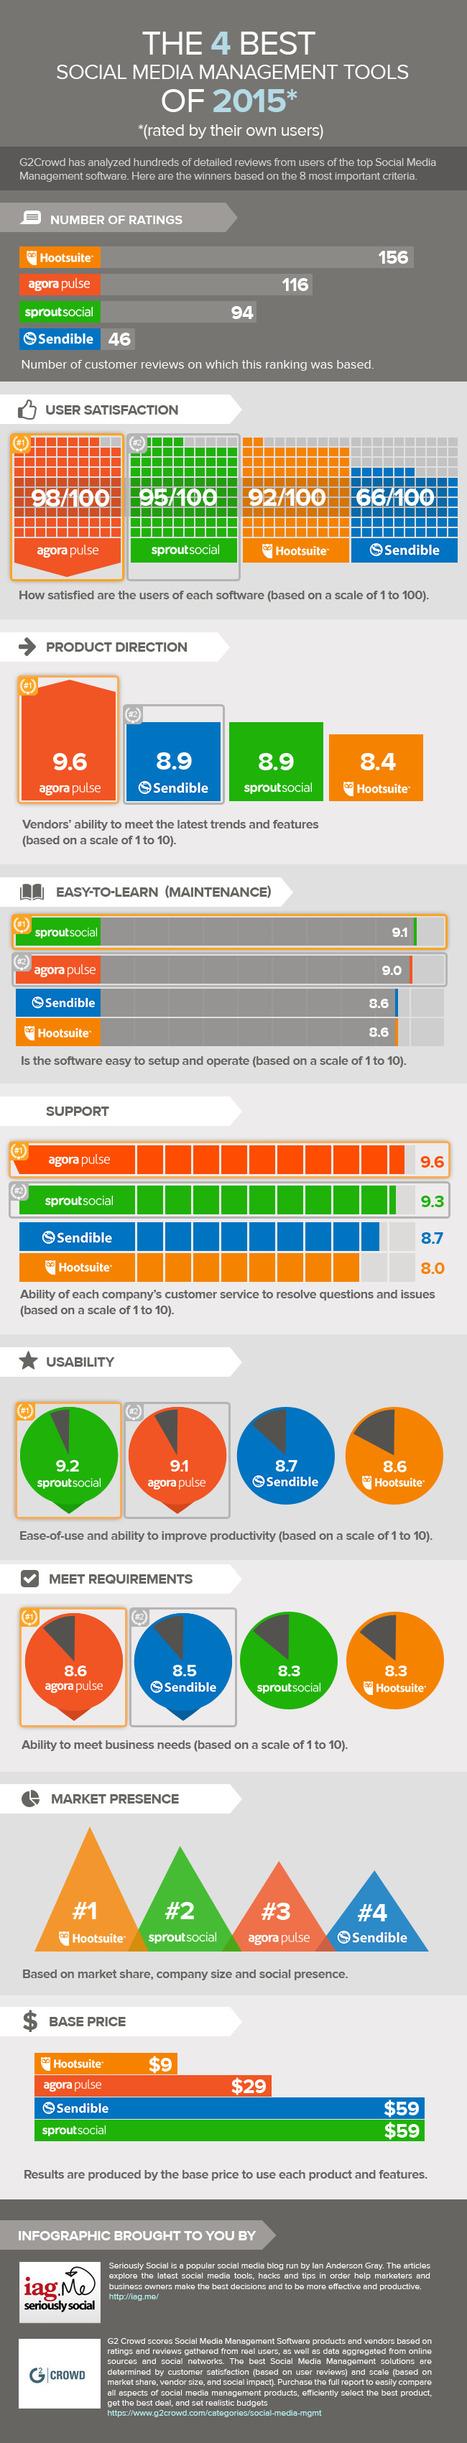 Branding - Top 4 Future Social Media Management Tools | All Infographics | Scoop.it